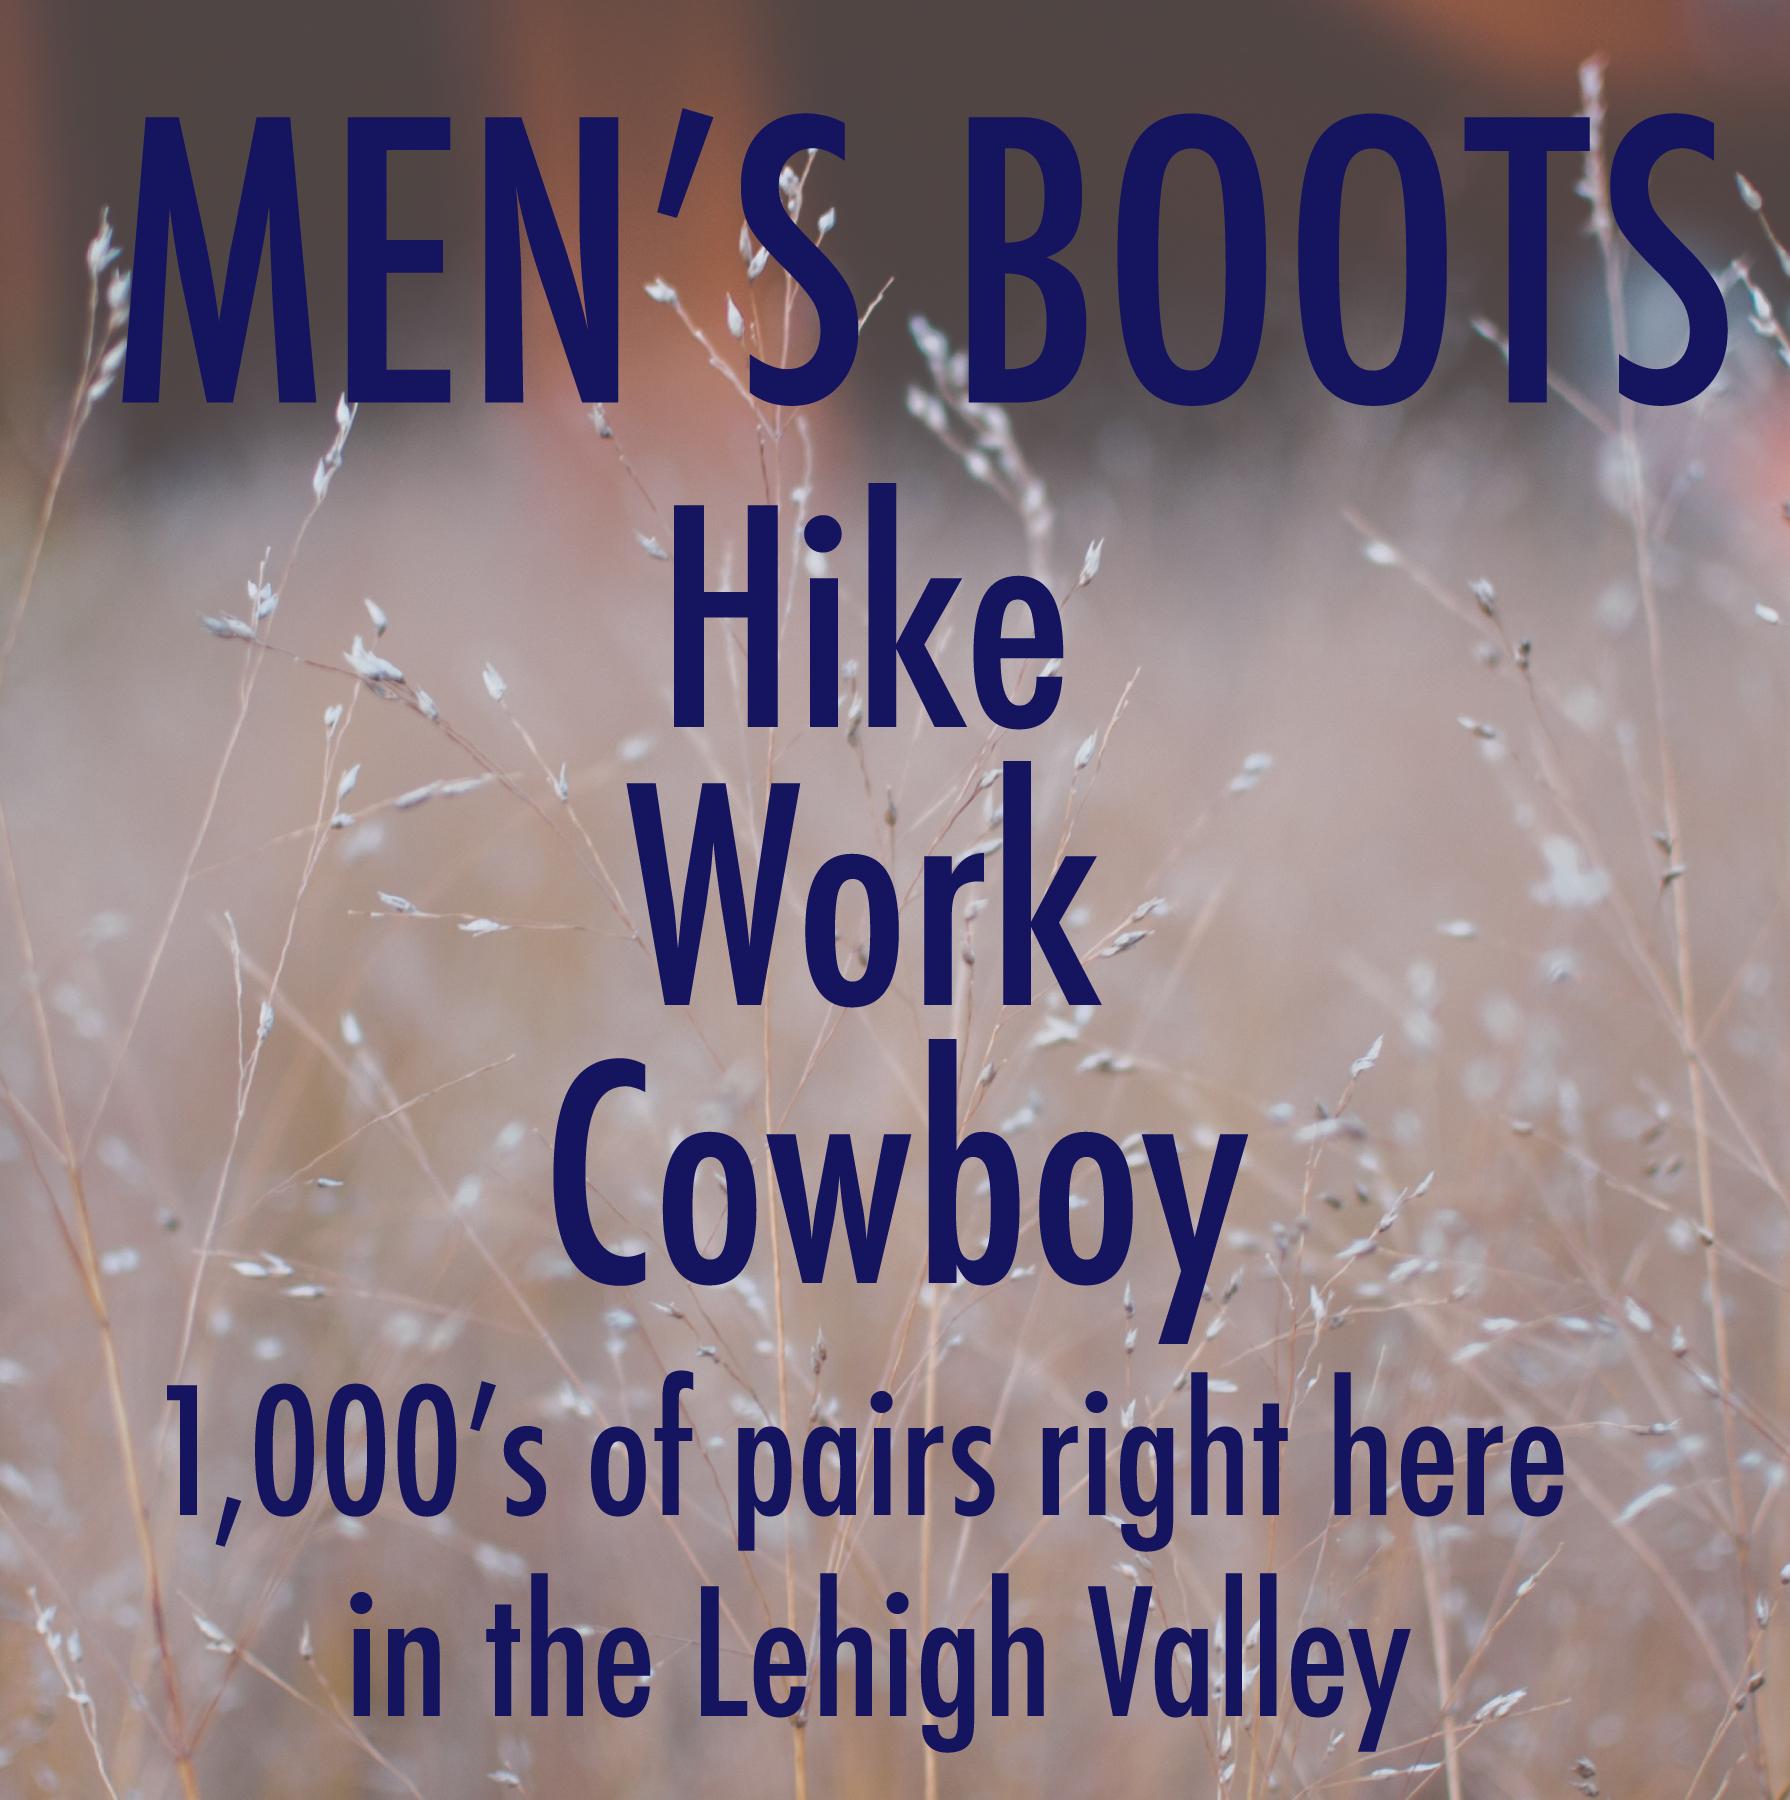 men-s-boots-general-boots.jpg